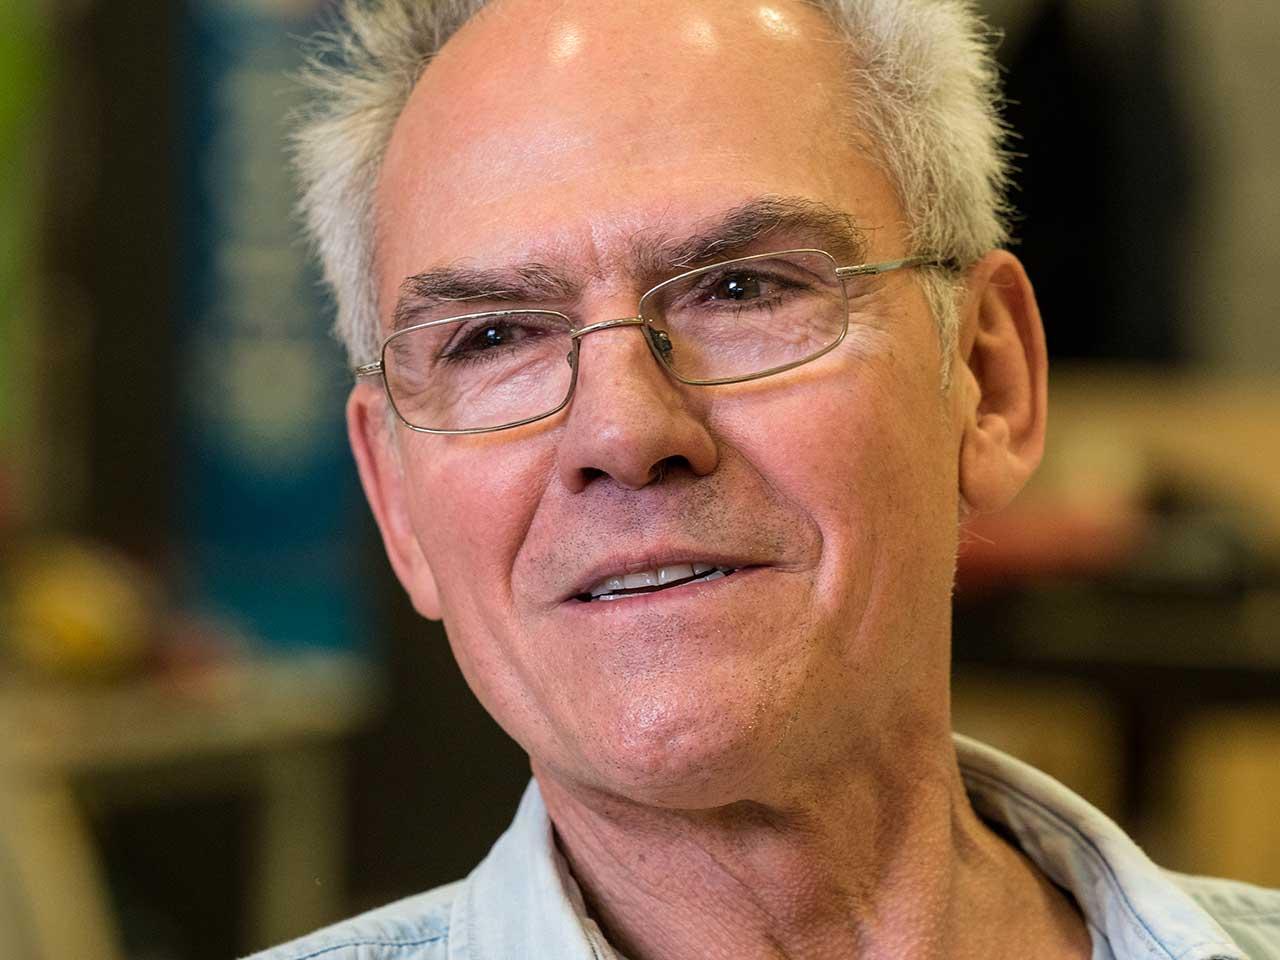 Omer Thibault, menuisier